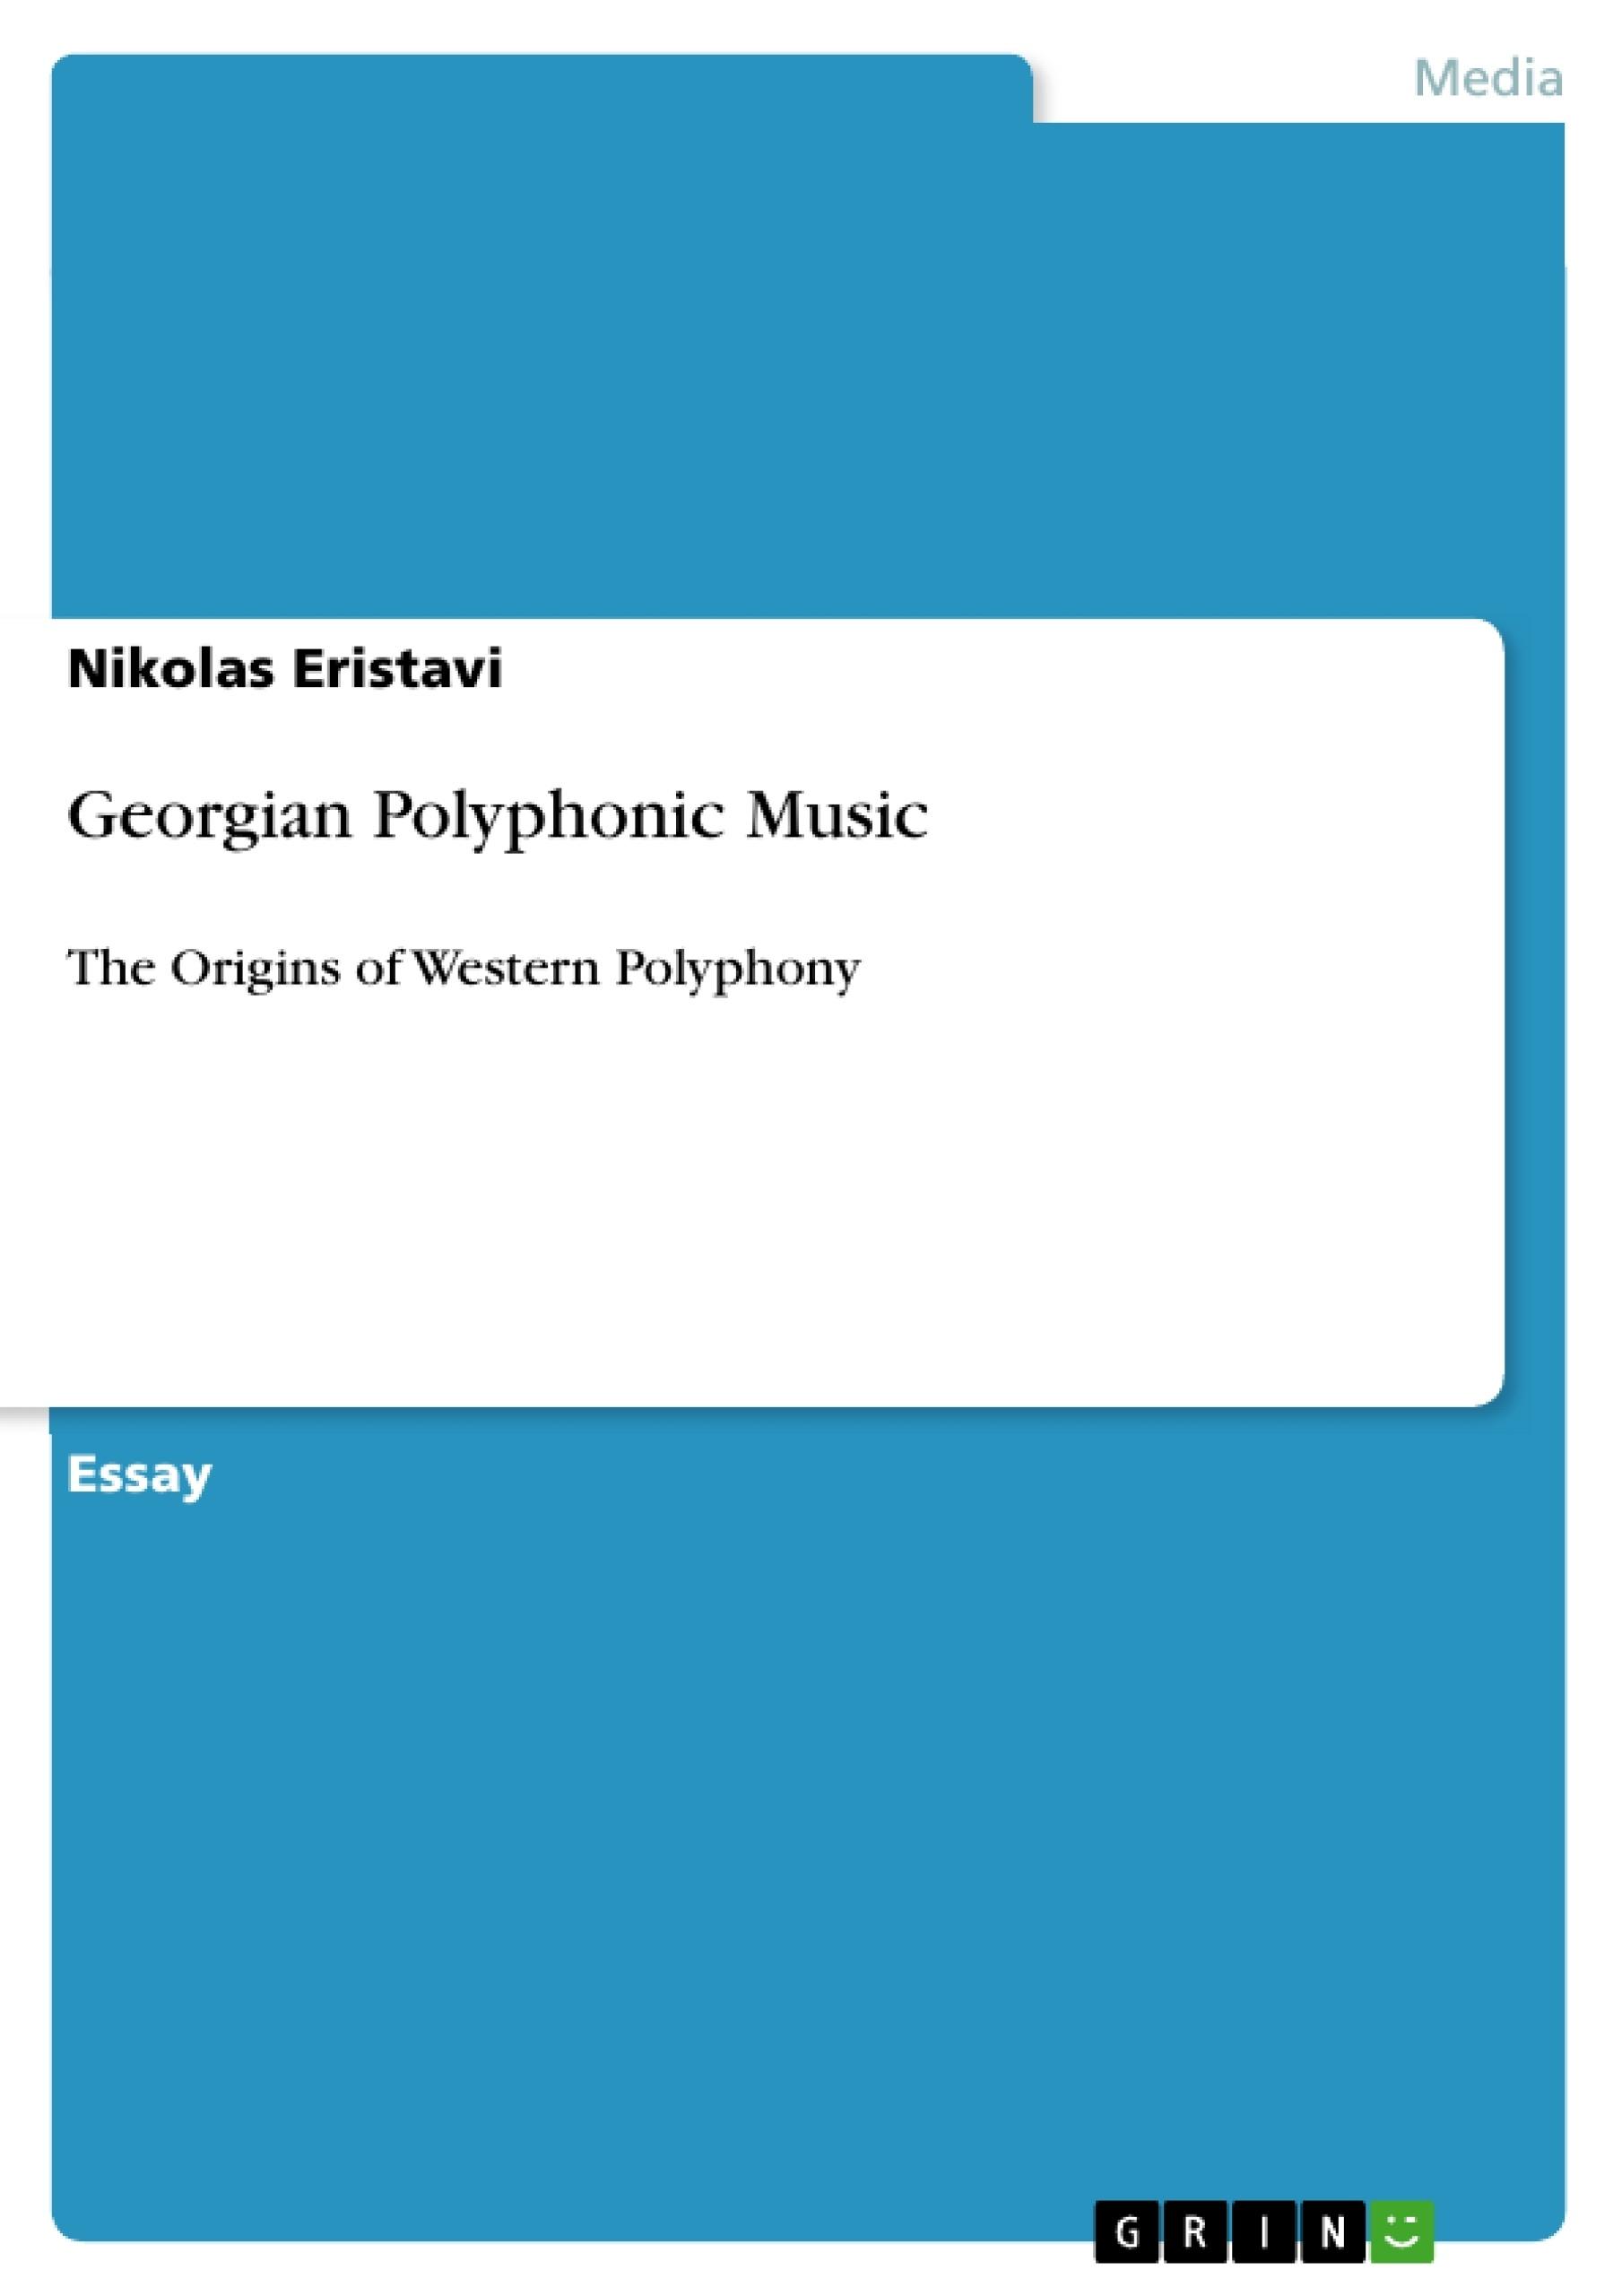 Title: Georgian Polyphonic Music